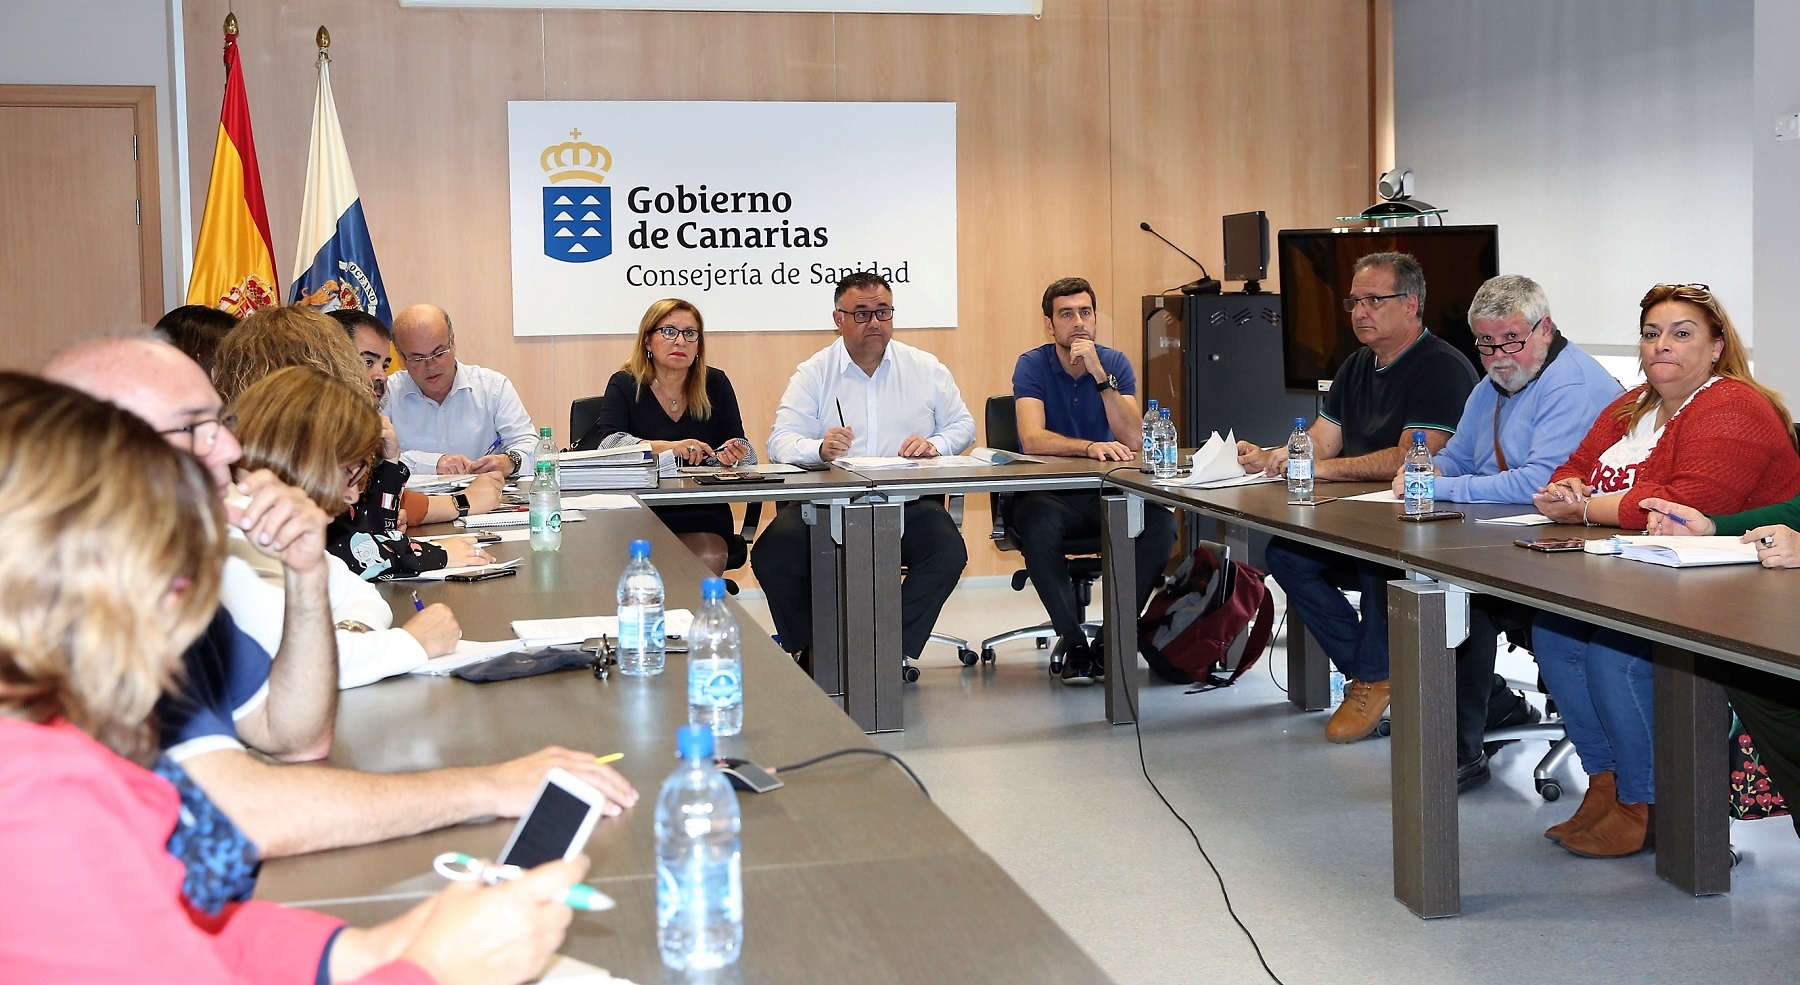 Reunión de la Mesa Sectorial sobre la Oferta de Empleo Público